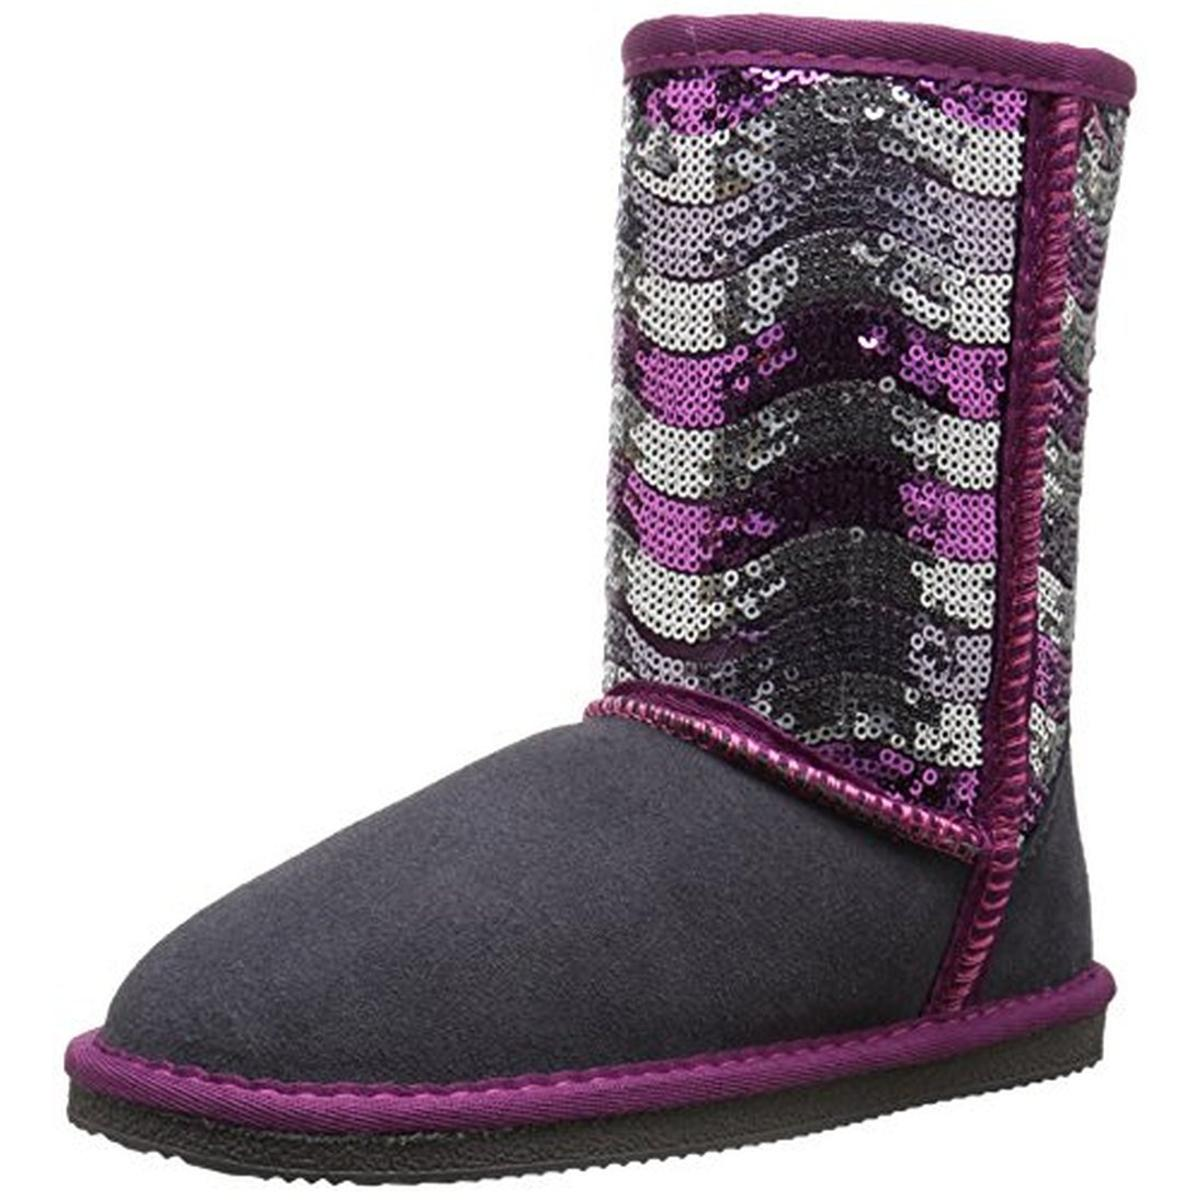 Lamo Girls Stripy Suede Casual Boots by Lamo